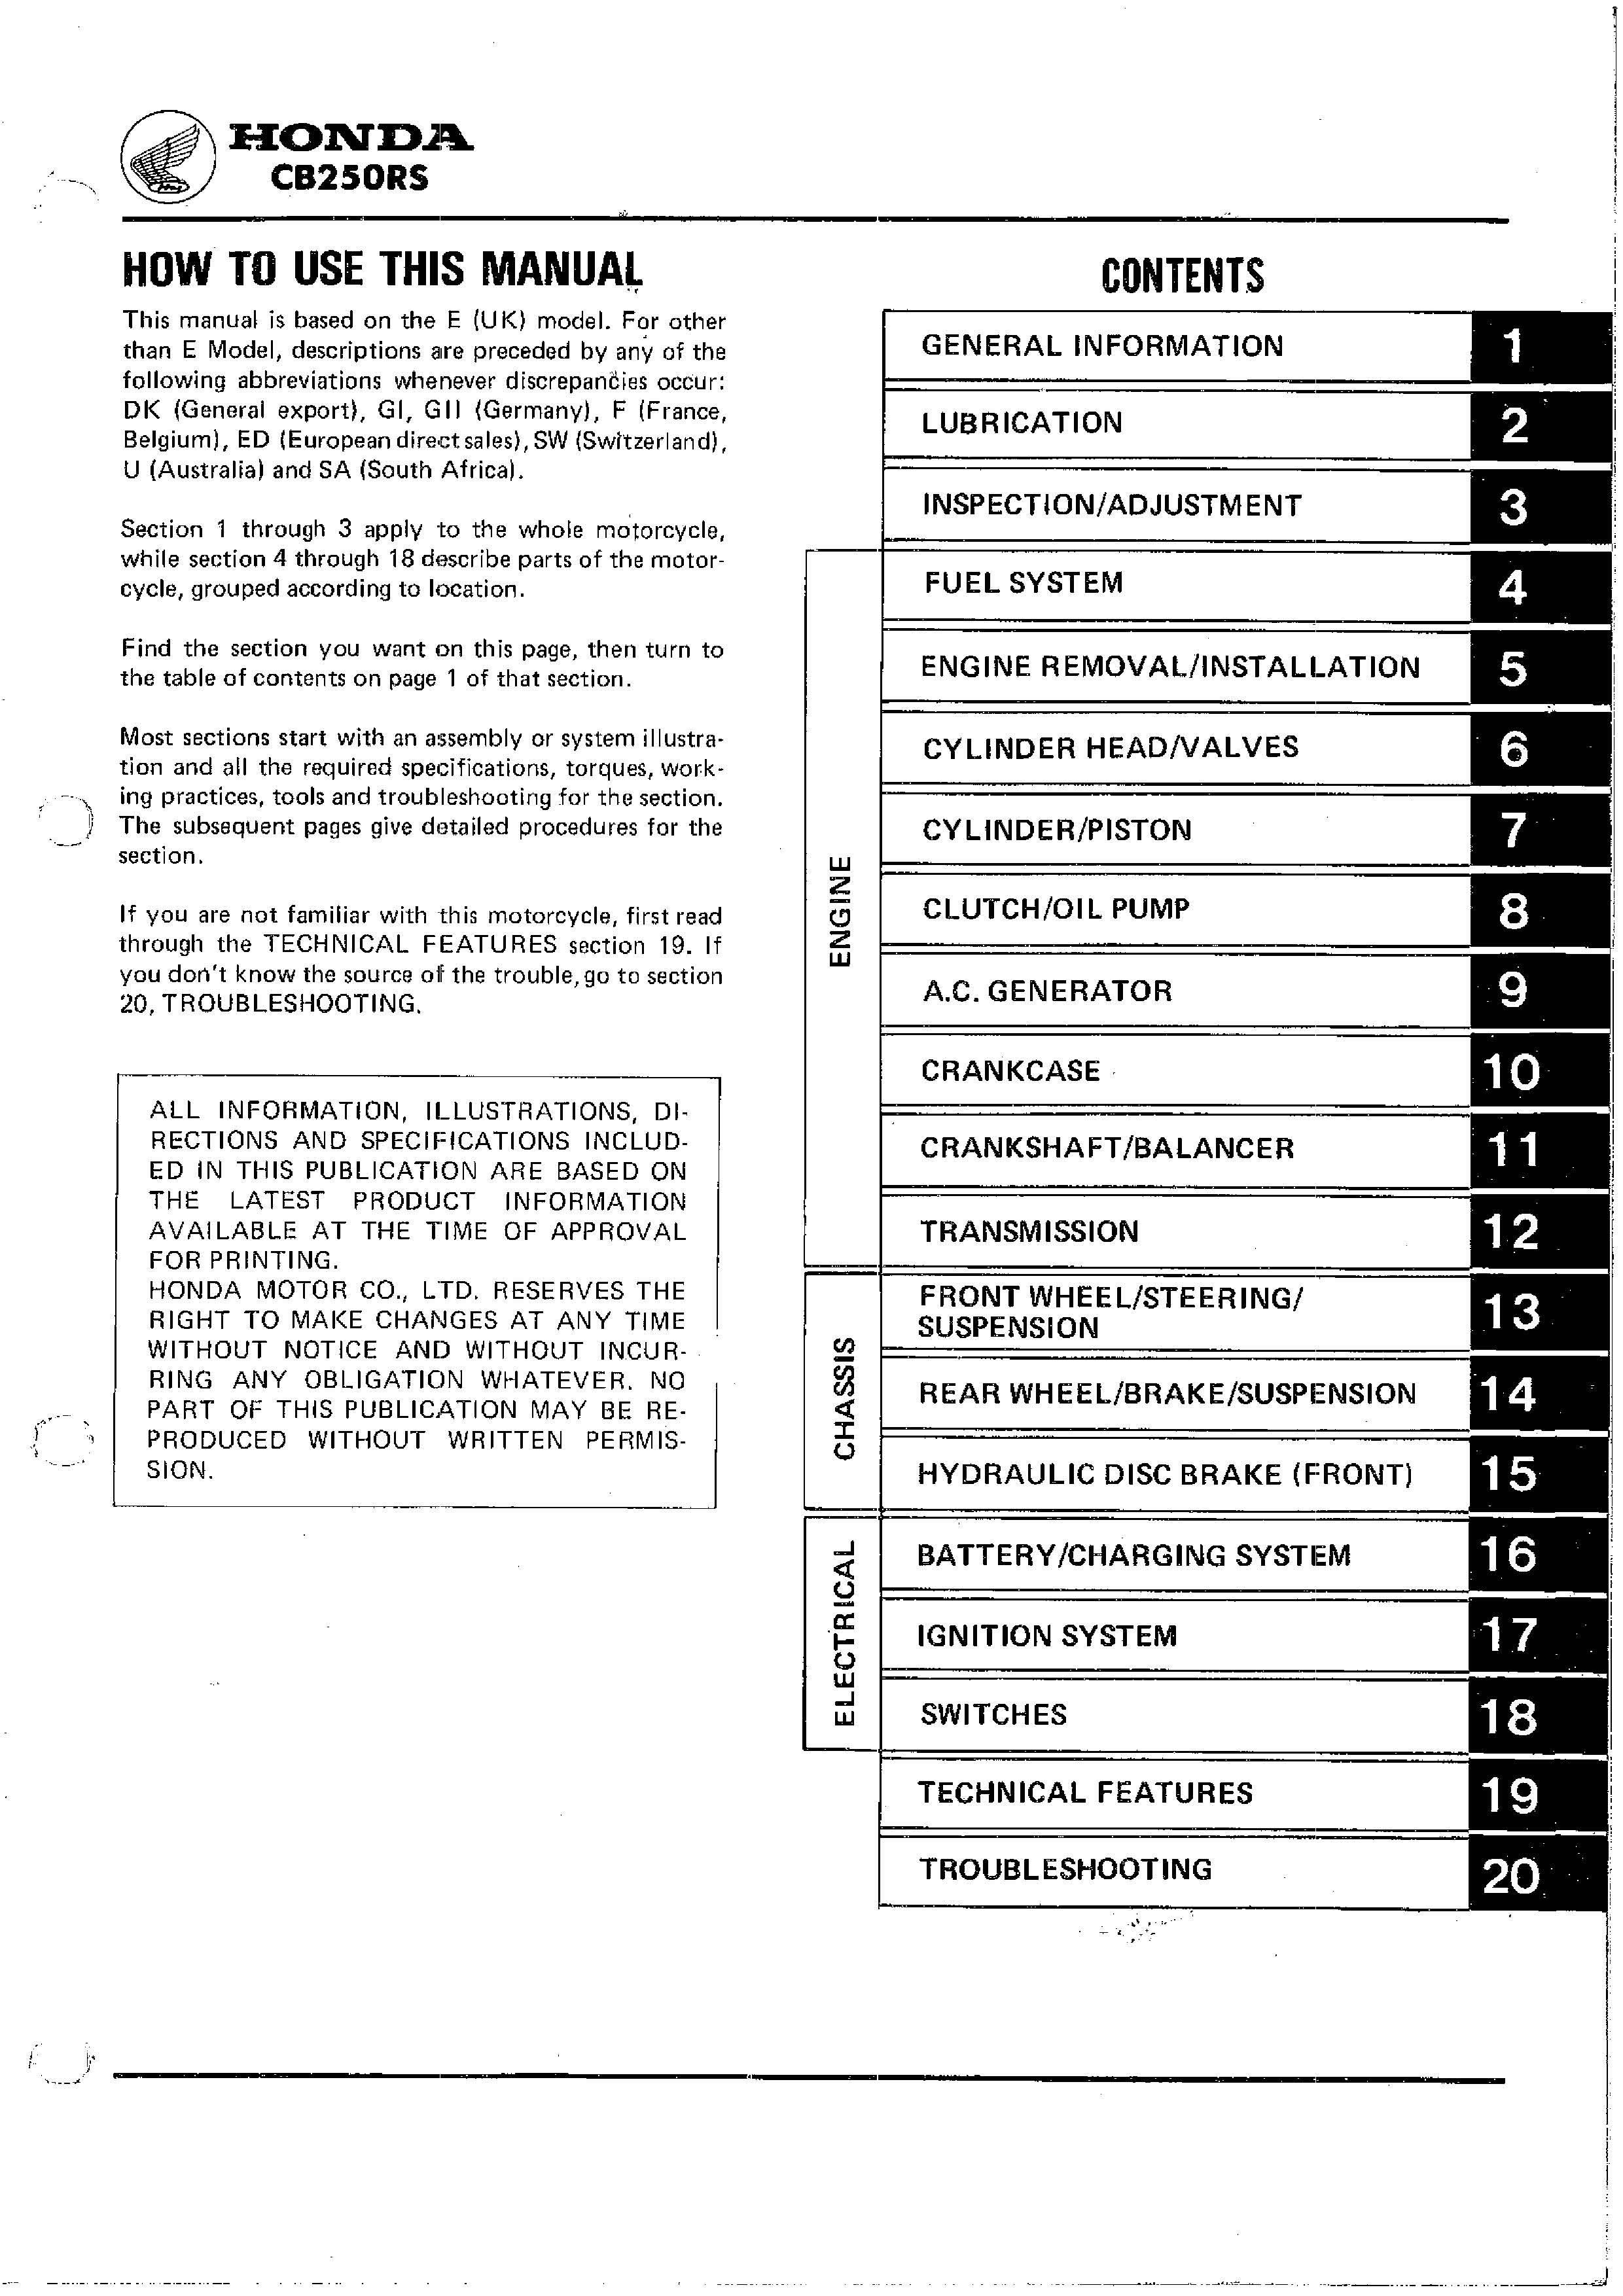 Workshop manual for Honda CB250RS